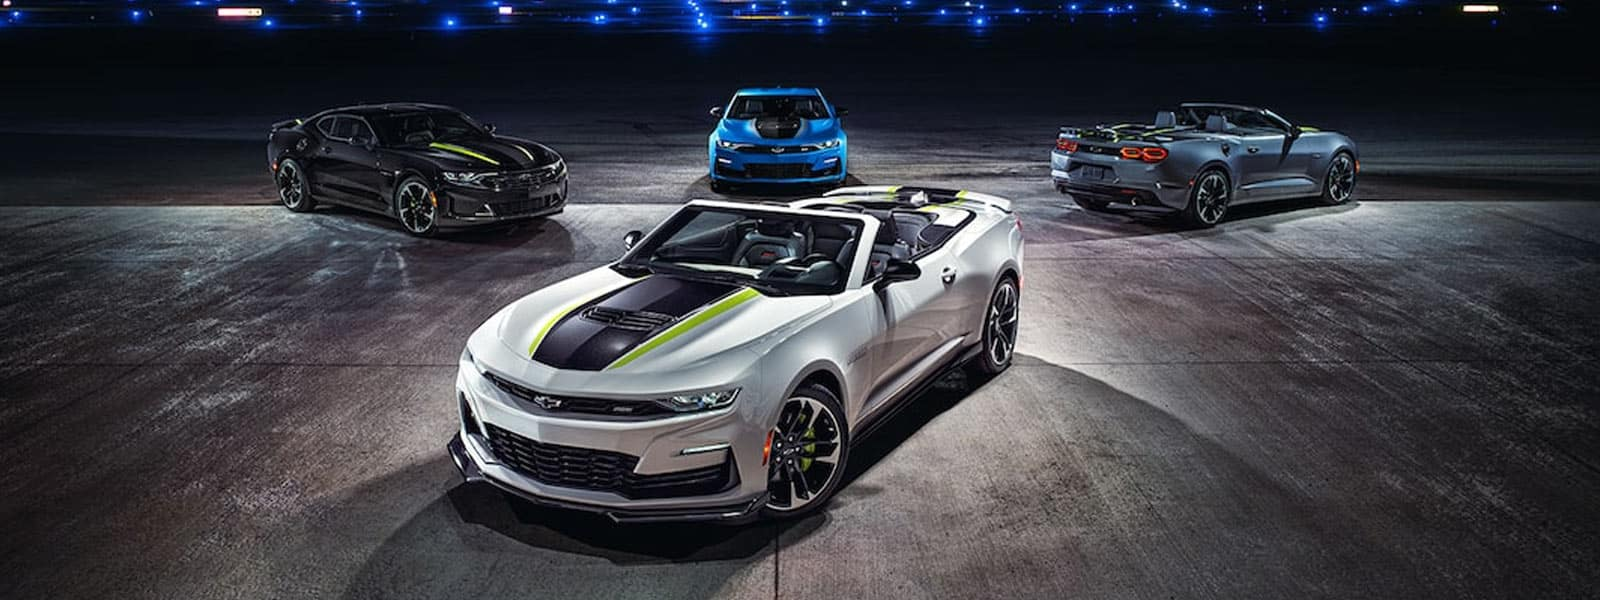 Finance or Lease new 2022 Chevrolet Camaro in Thornhill near Toronto Ontario